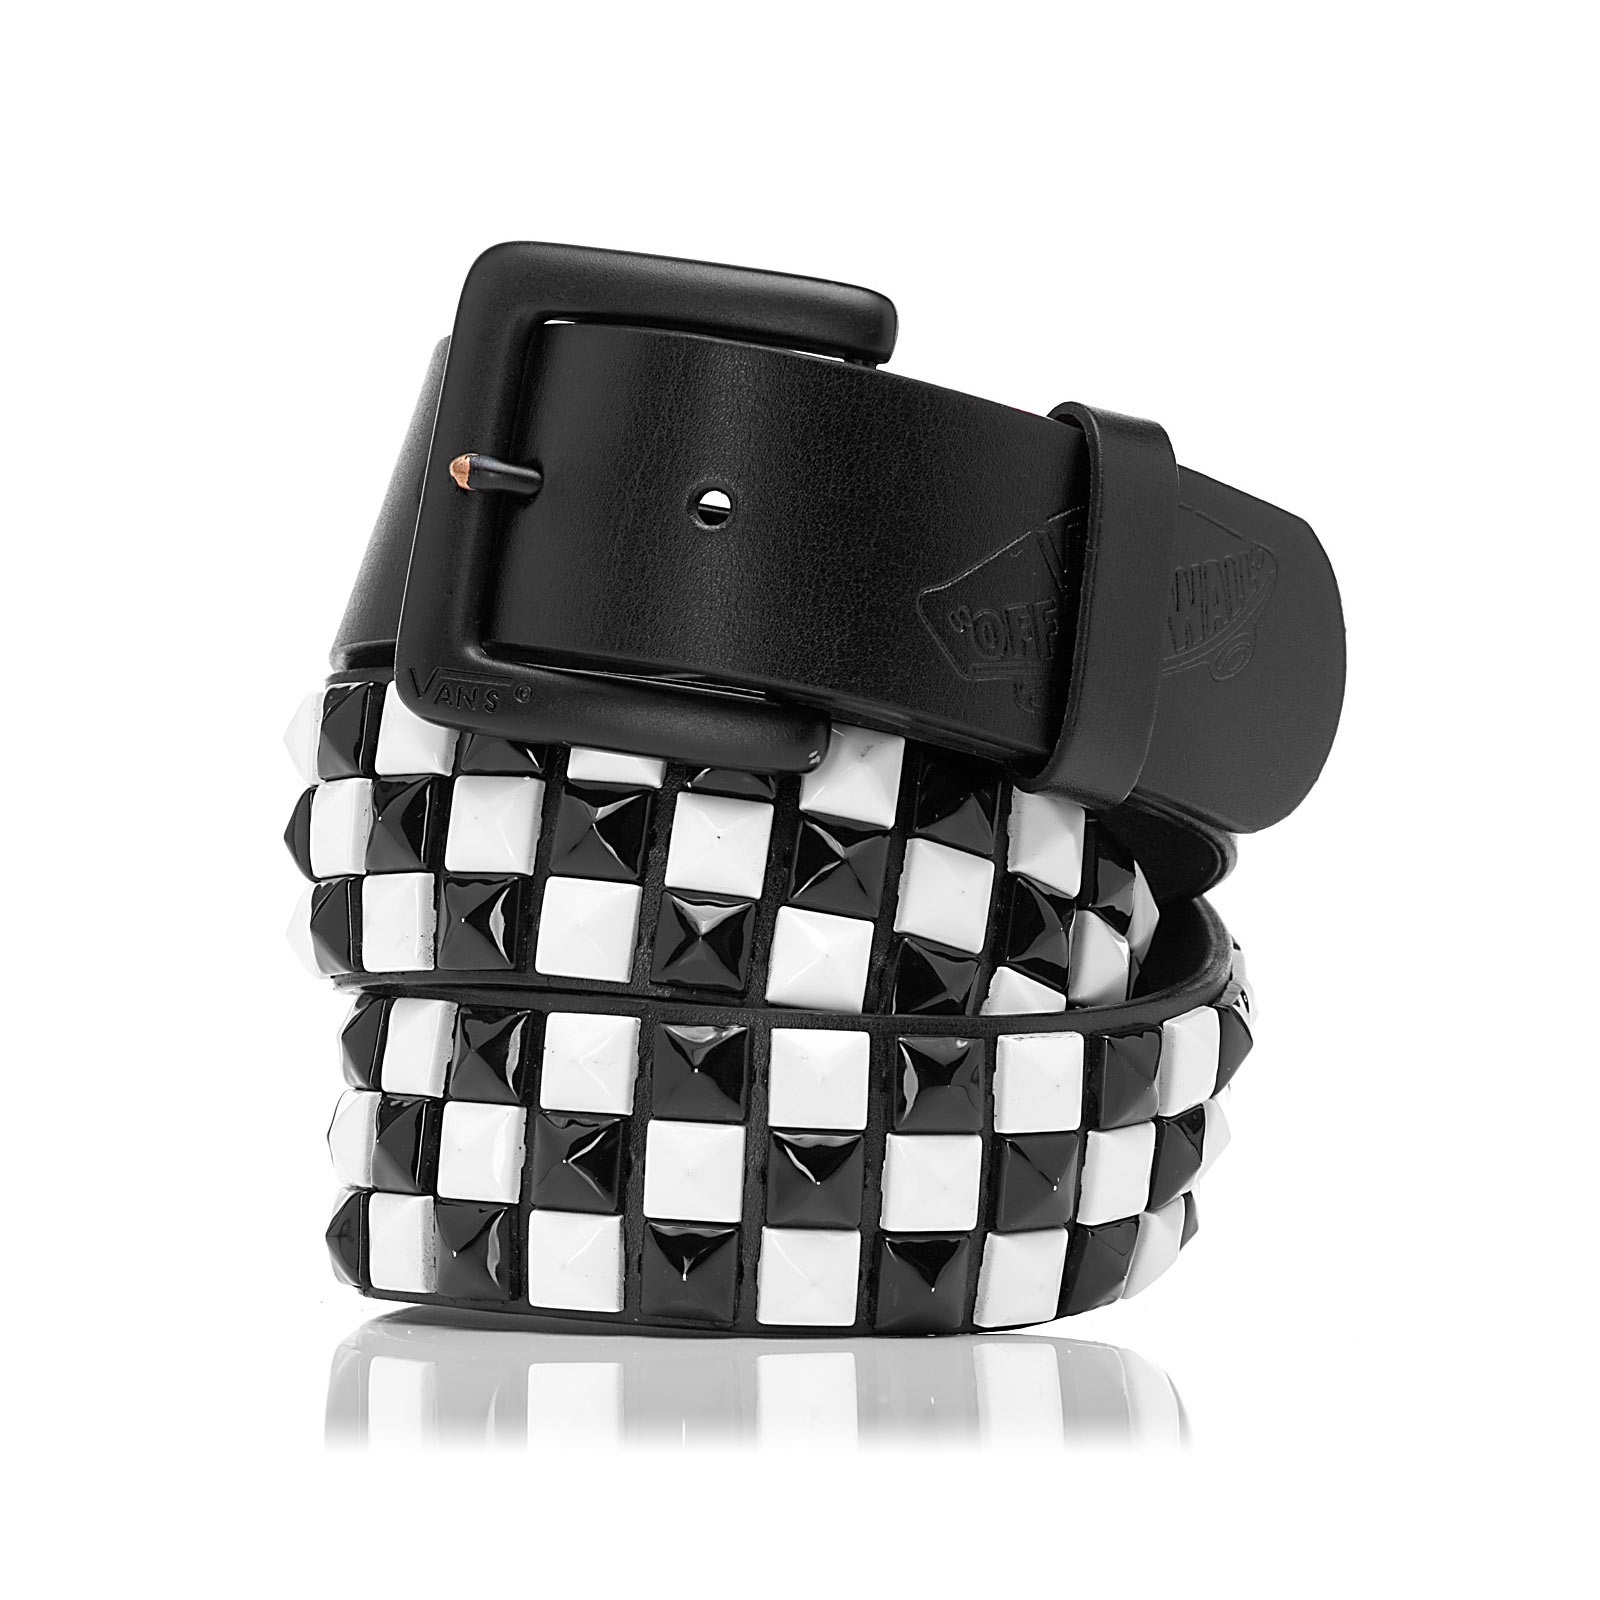 614b5ceecd Vans Studded Leather Belt Eu black white